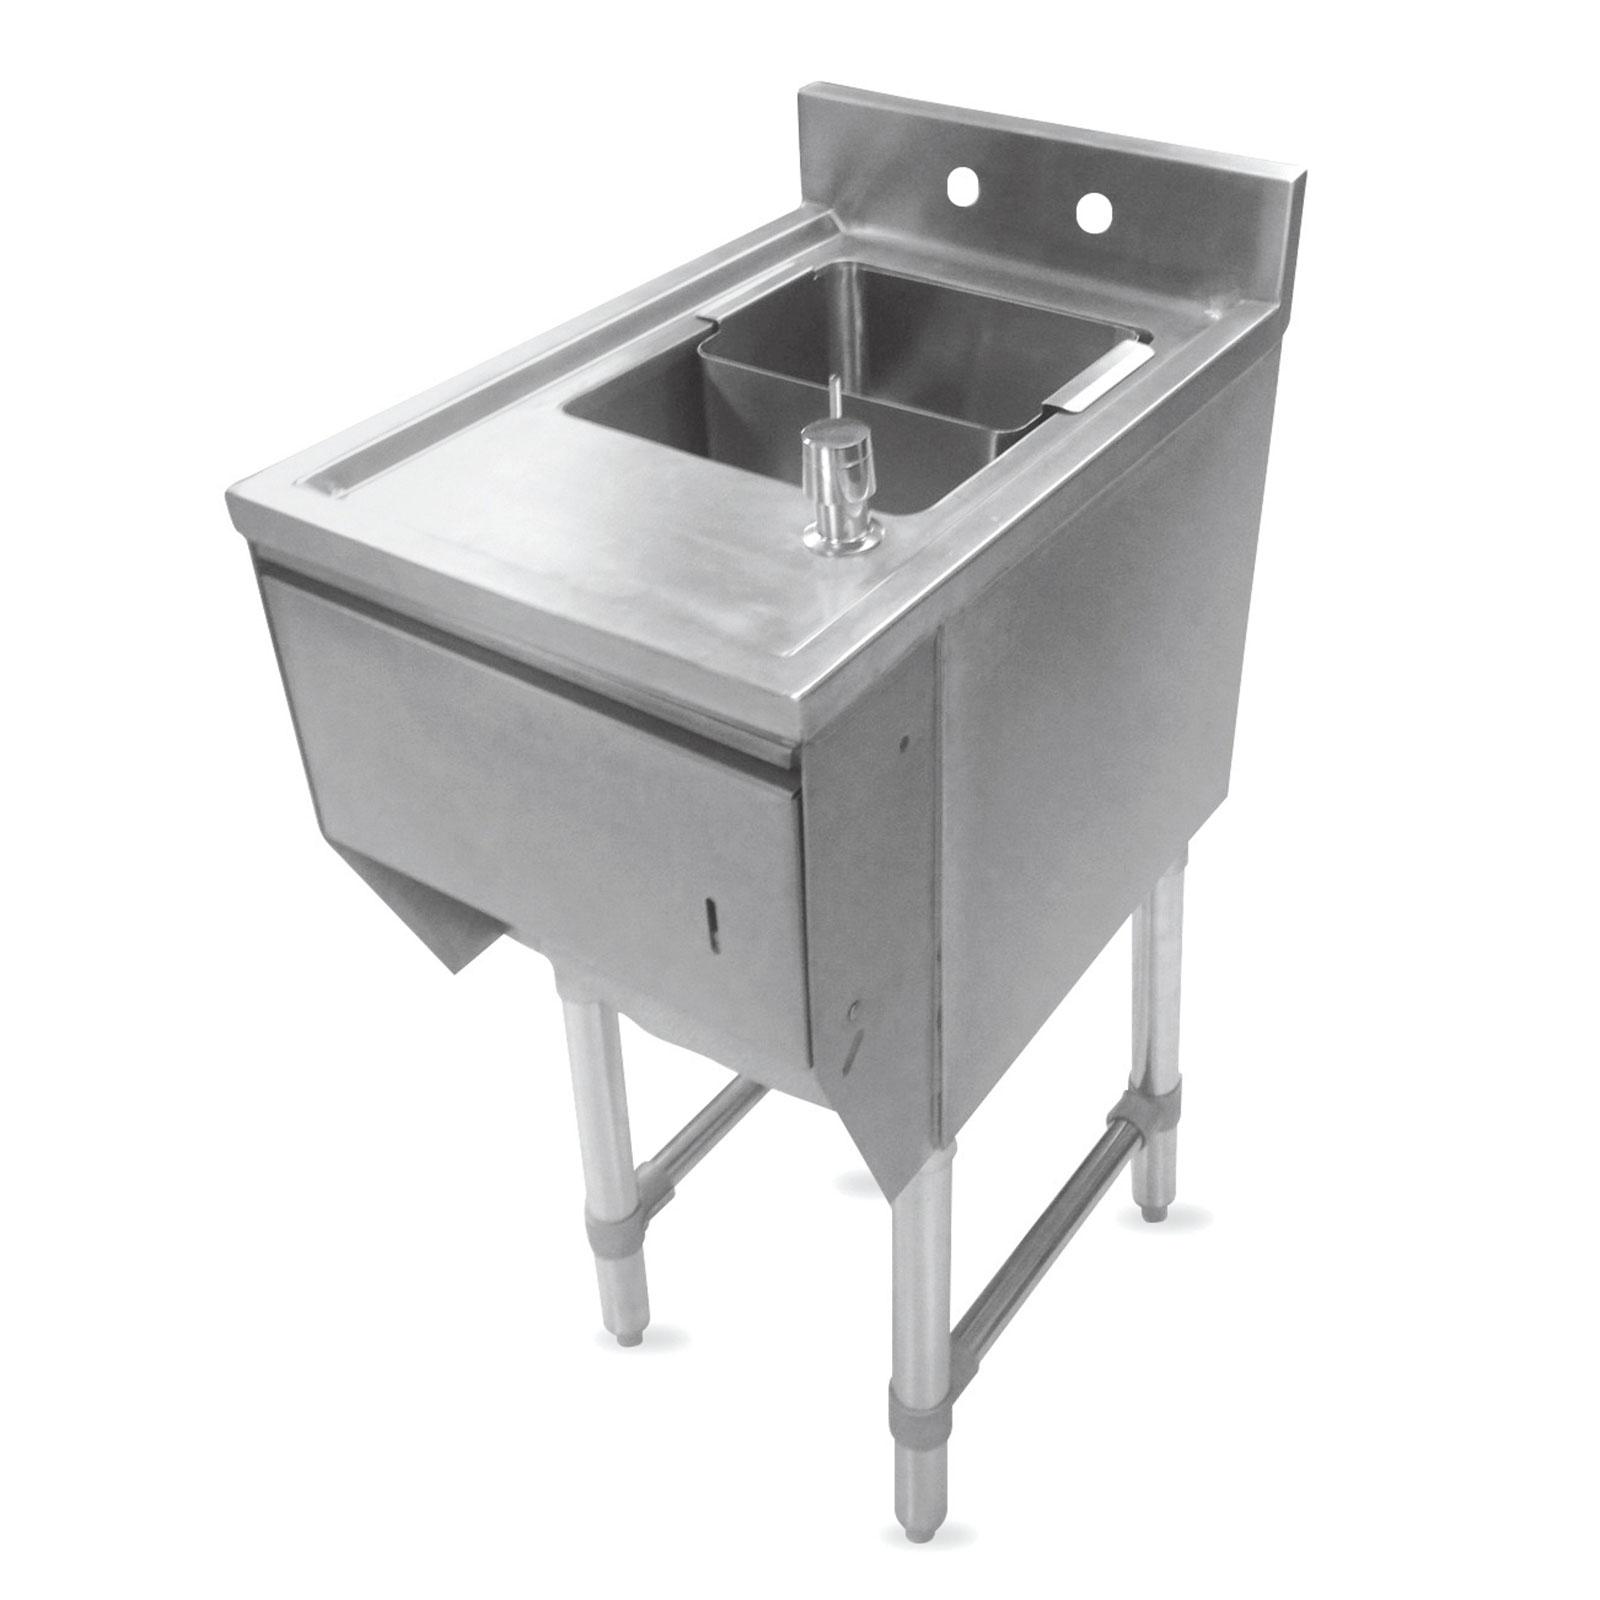 John Boos EUBDS-1221STD underbar sink units